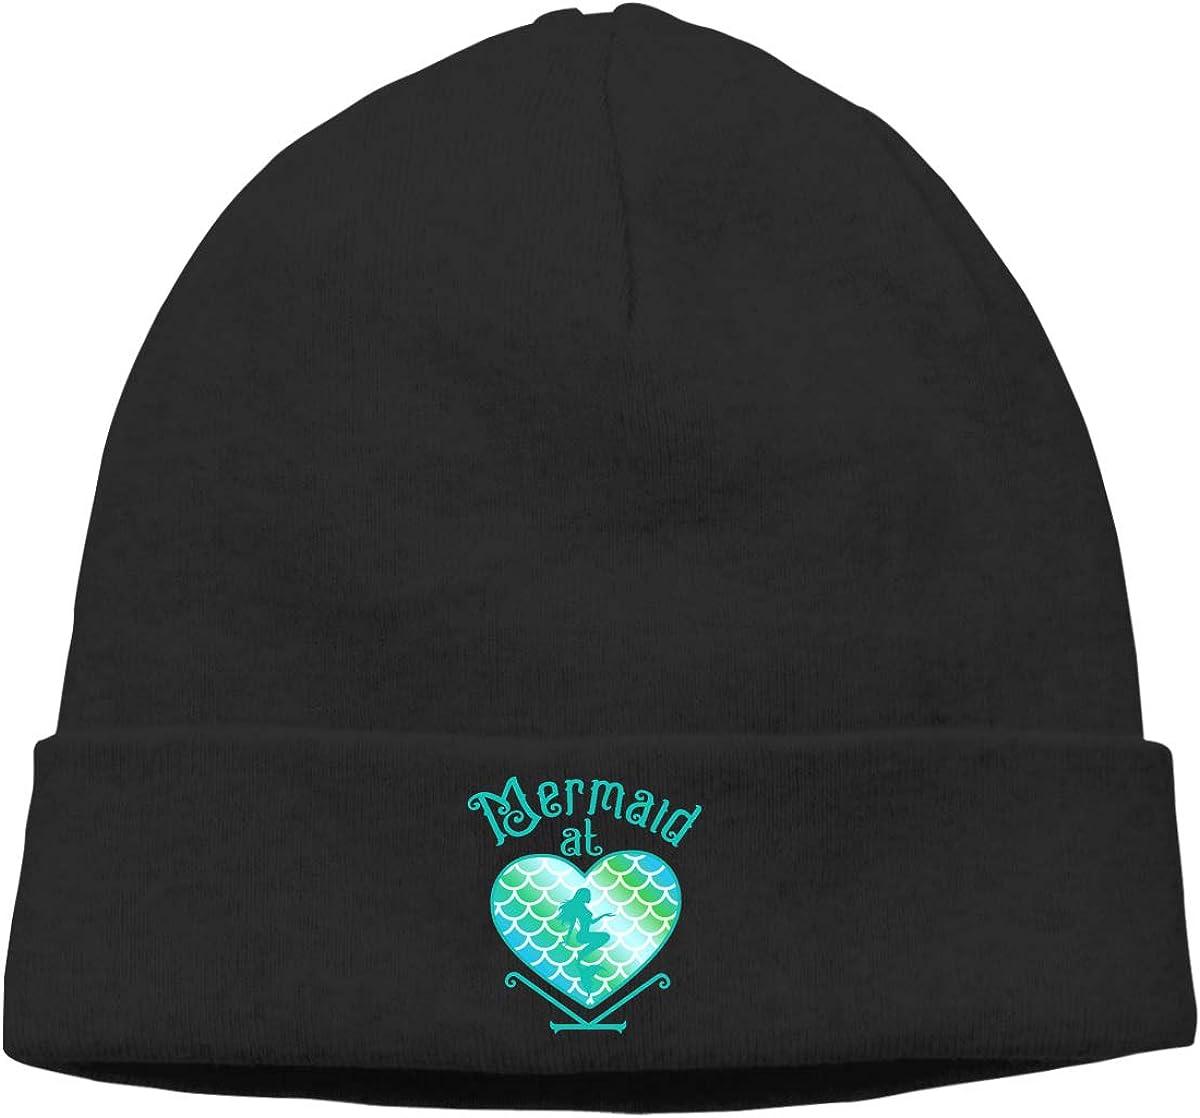 Mermaid at Heart Beanie Hats Cap Men /& Women Stretchy /& Soft Skull Cap Beanie Skull Cap